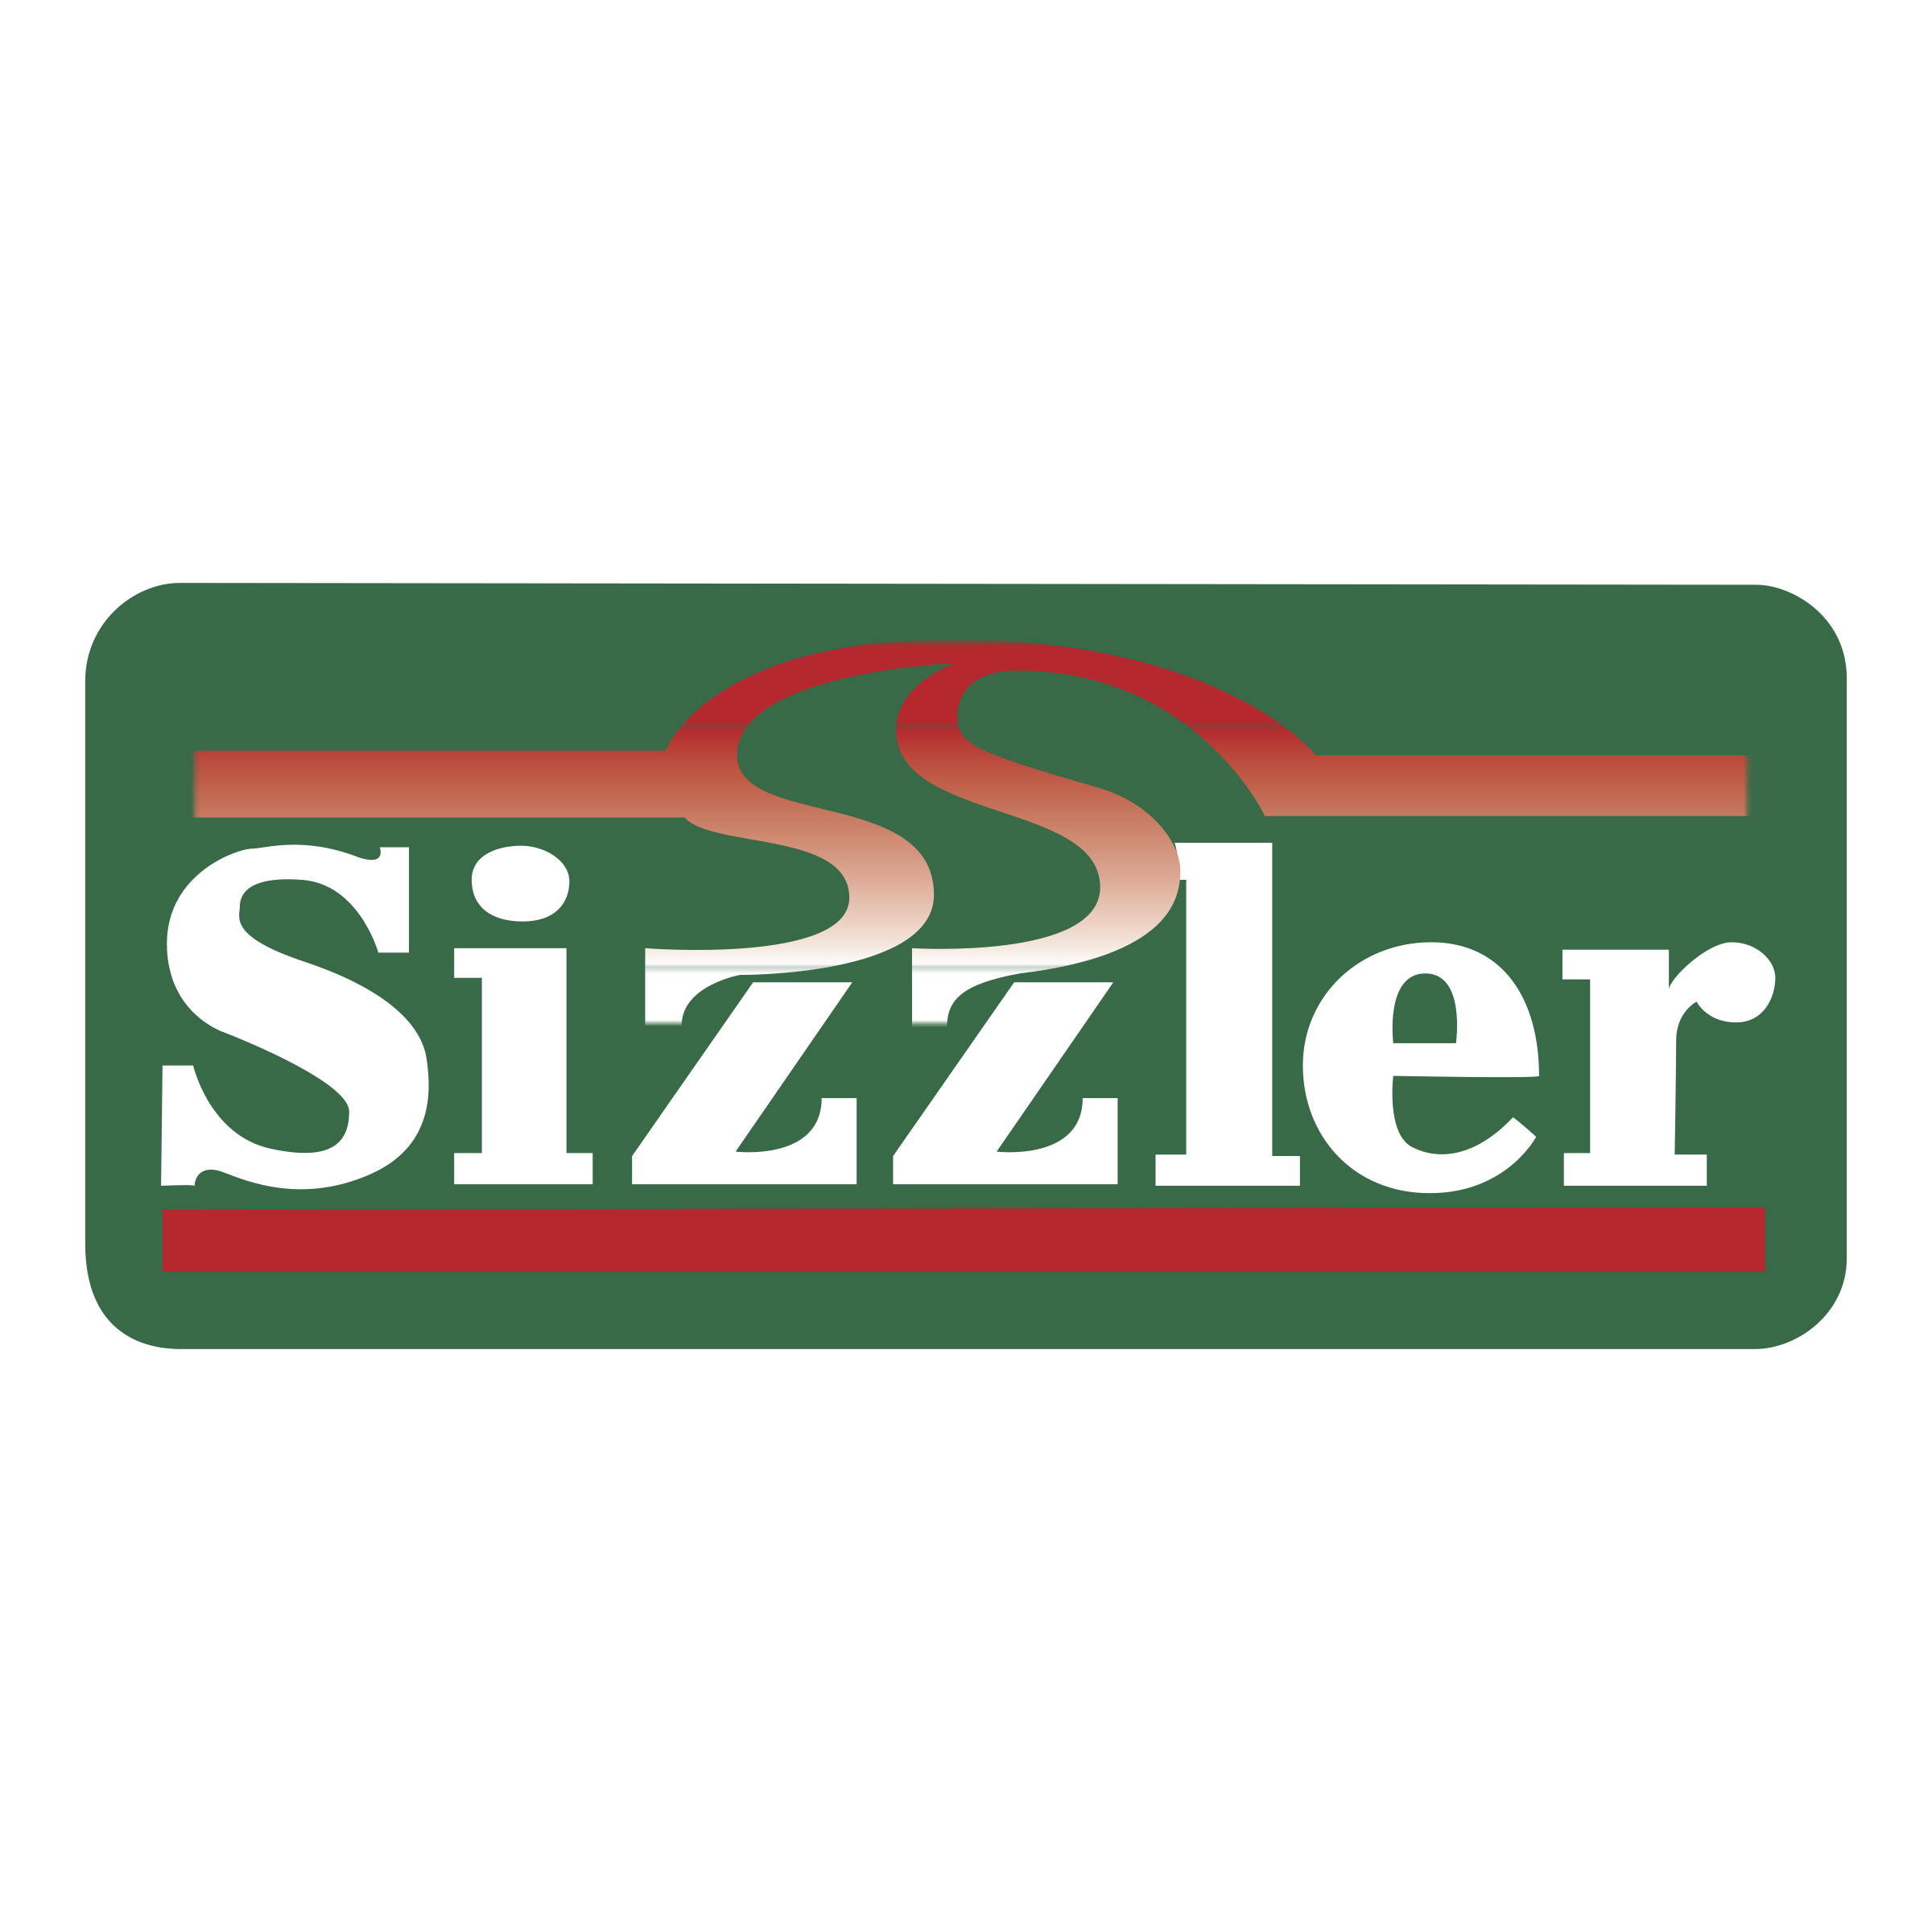 sizzler-1-logo-png-transparent.png